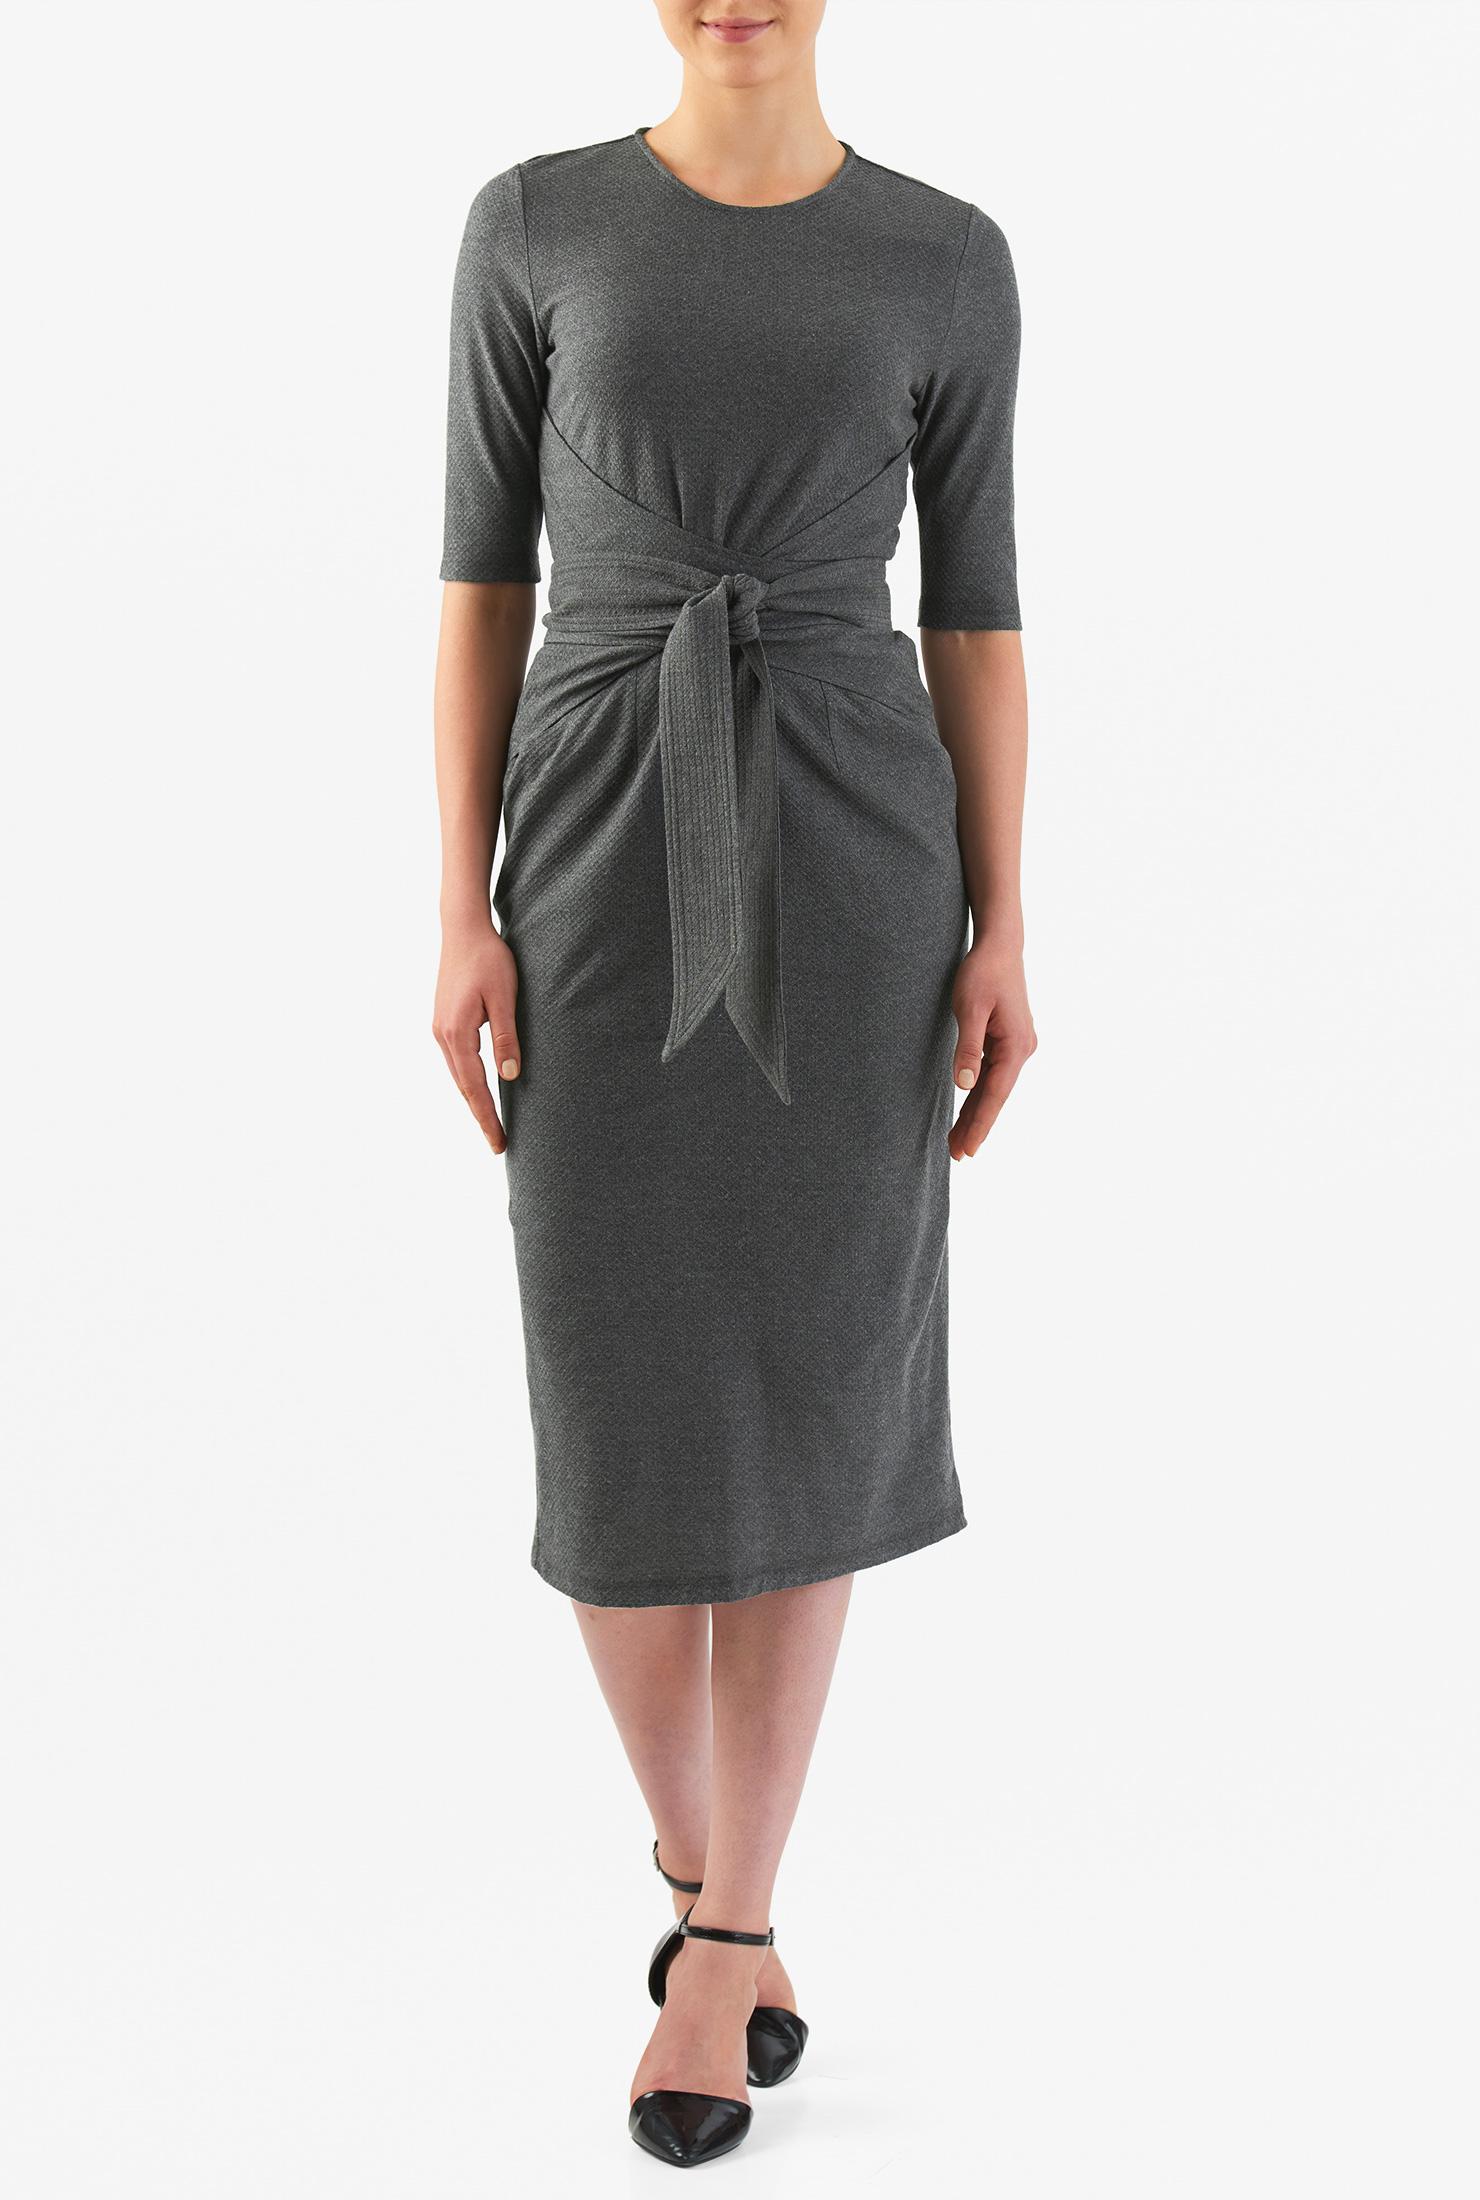 Eshakti Womens Obi Belt Textured Cotton Knit Sheath Dress